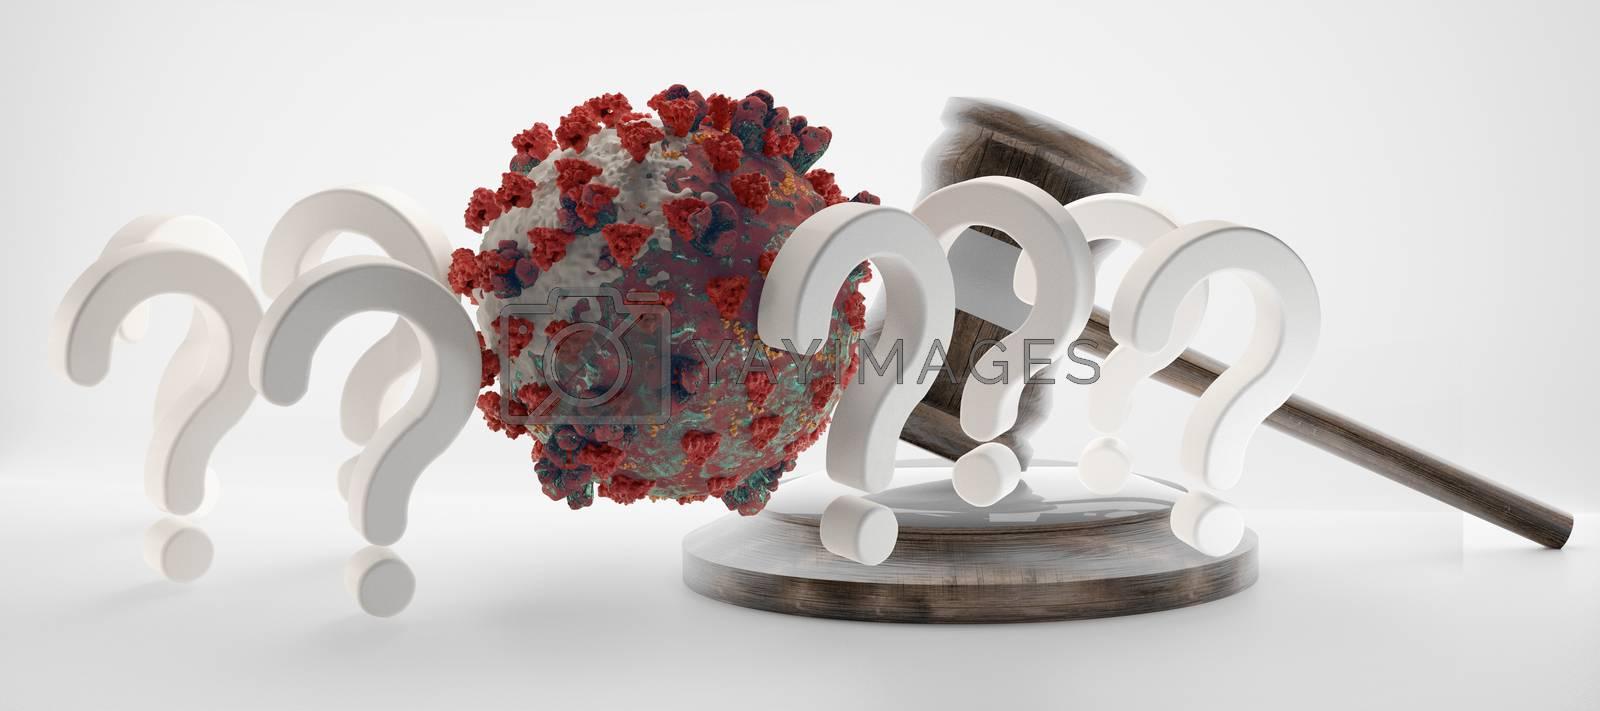 question marks judge gavel Coronavirus Covid-19 symbolic 3d-illustration